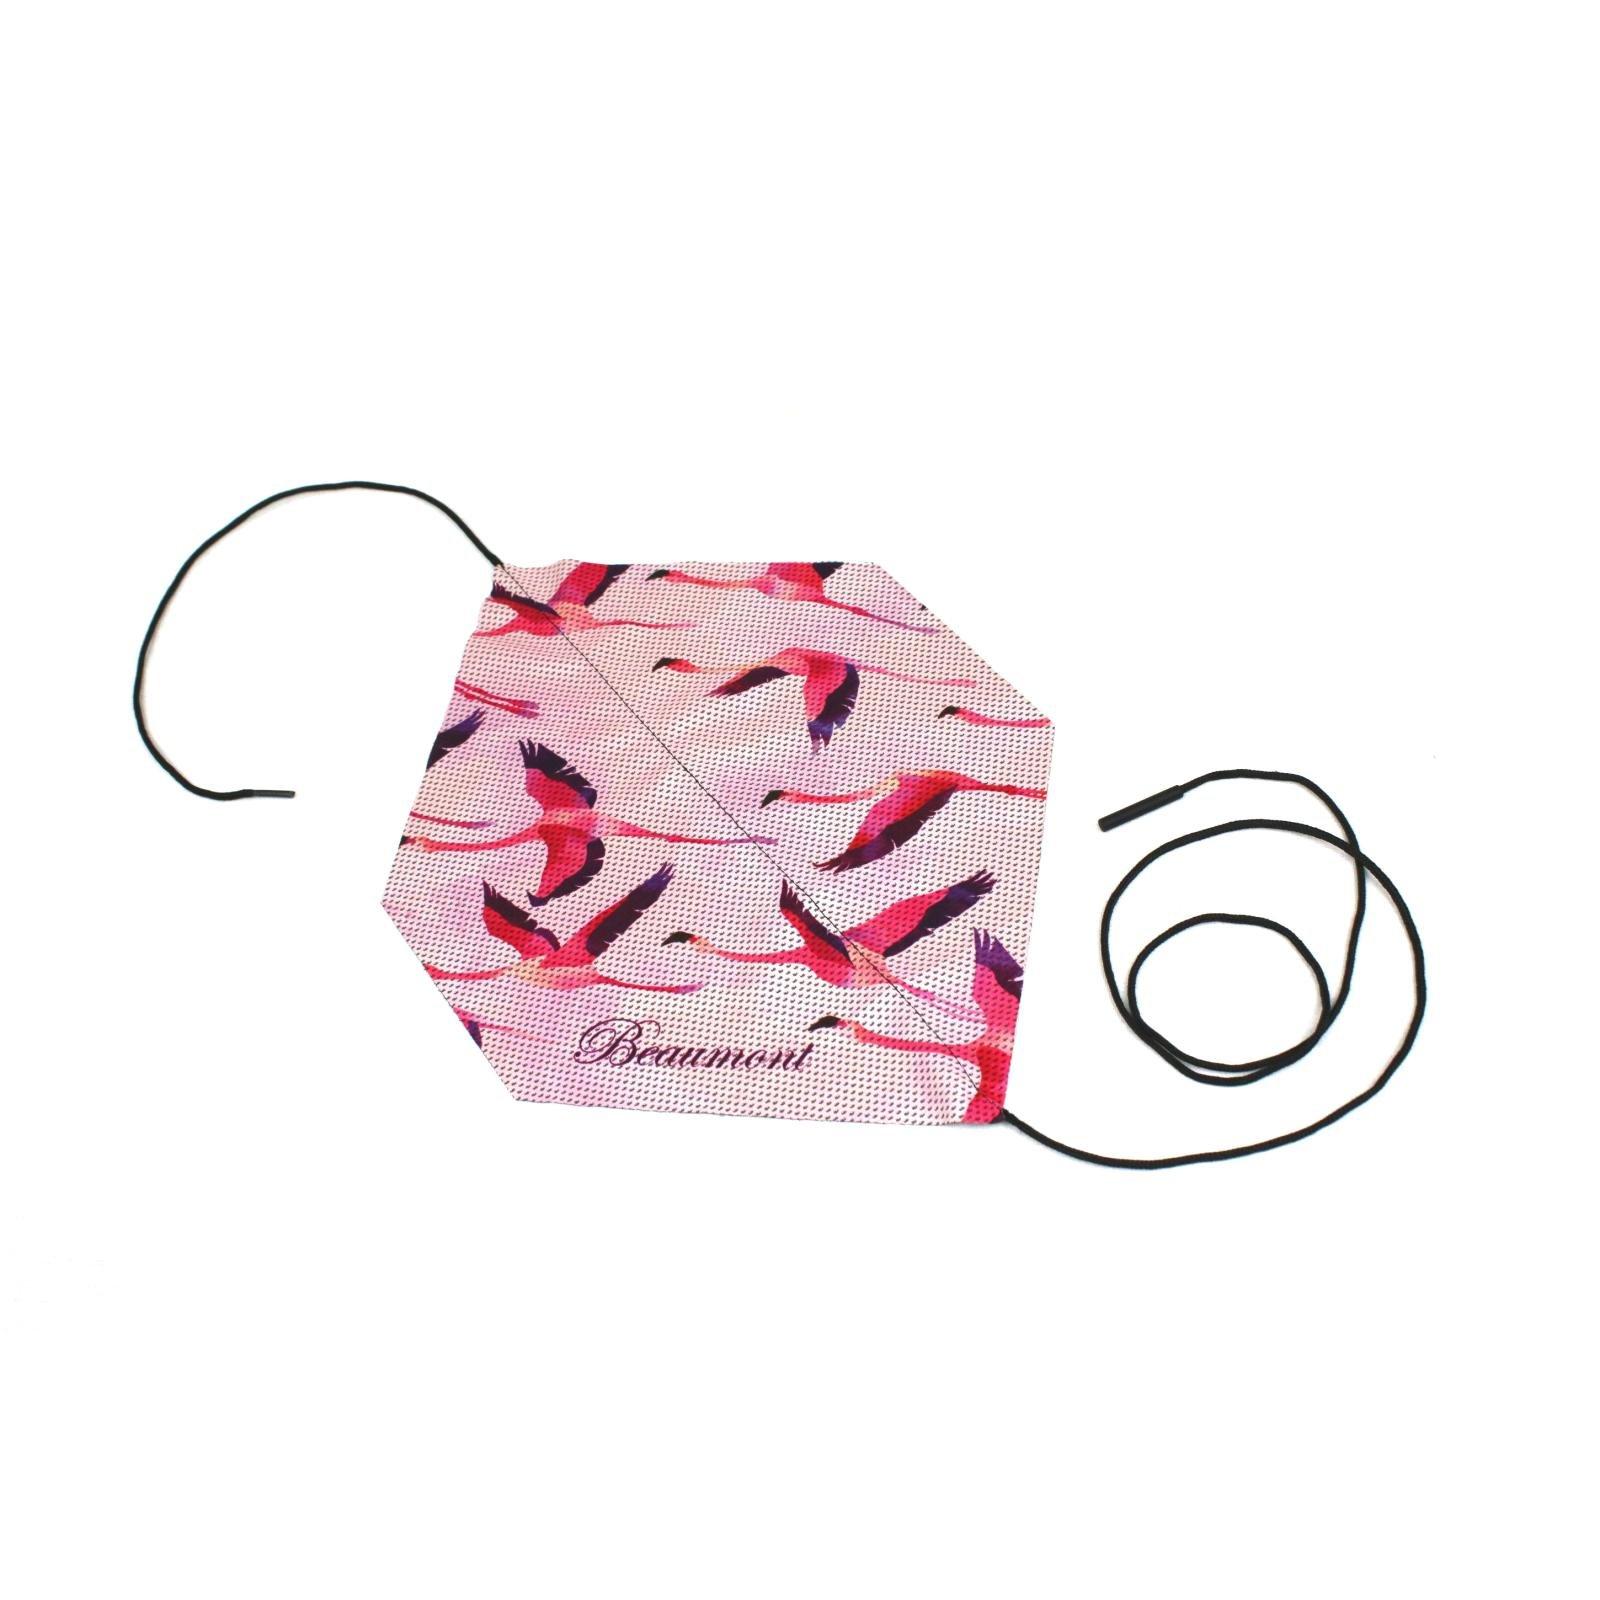 Flamingo Hustle Bb Clarinet Swab